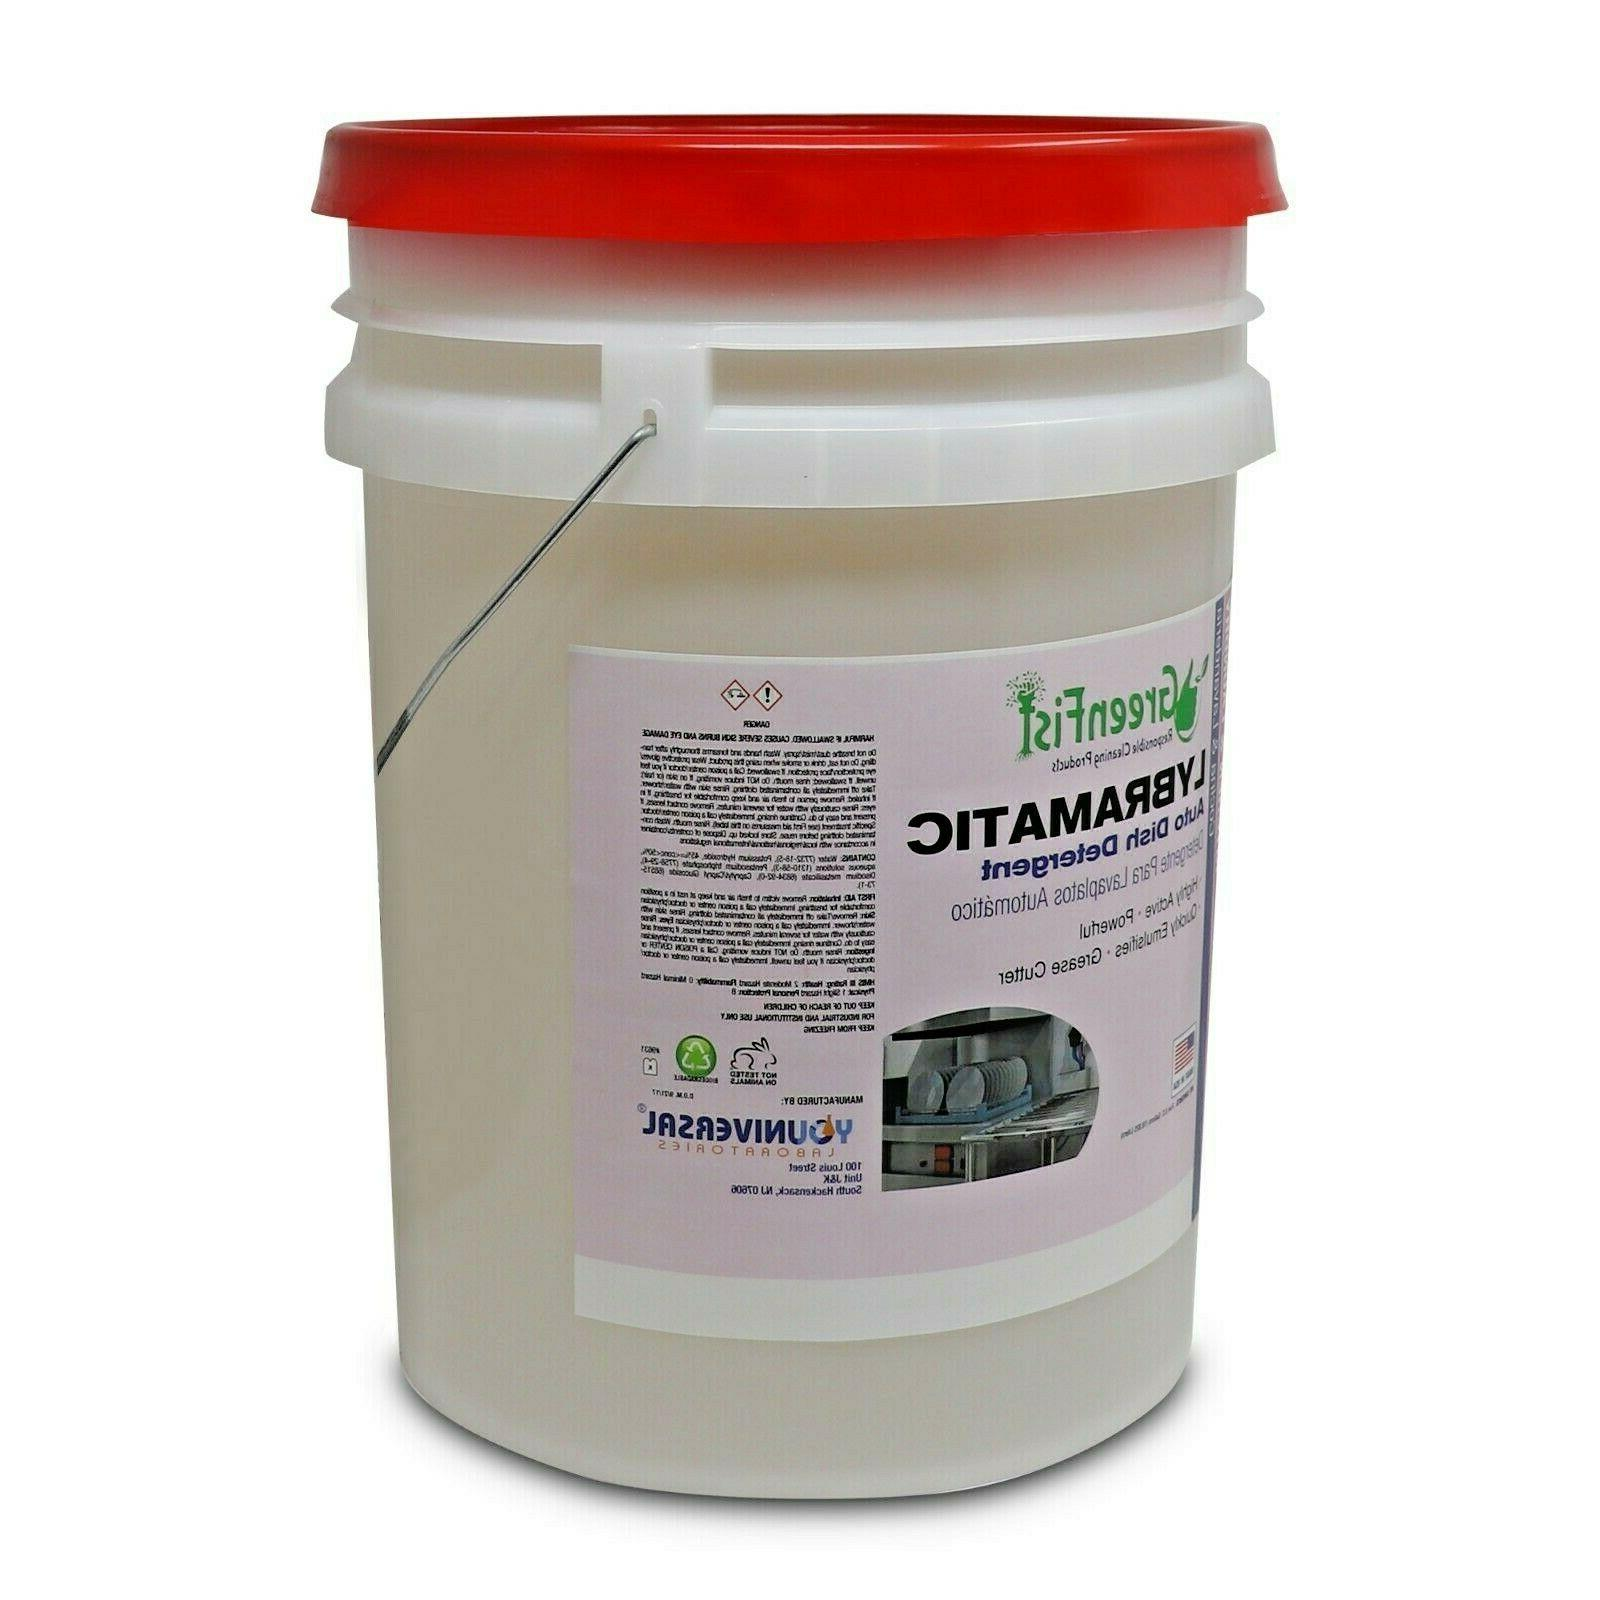 GreenFist Lybramatic Commercial Dishwasher Detergent